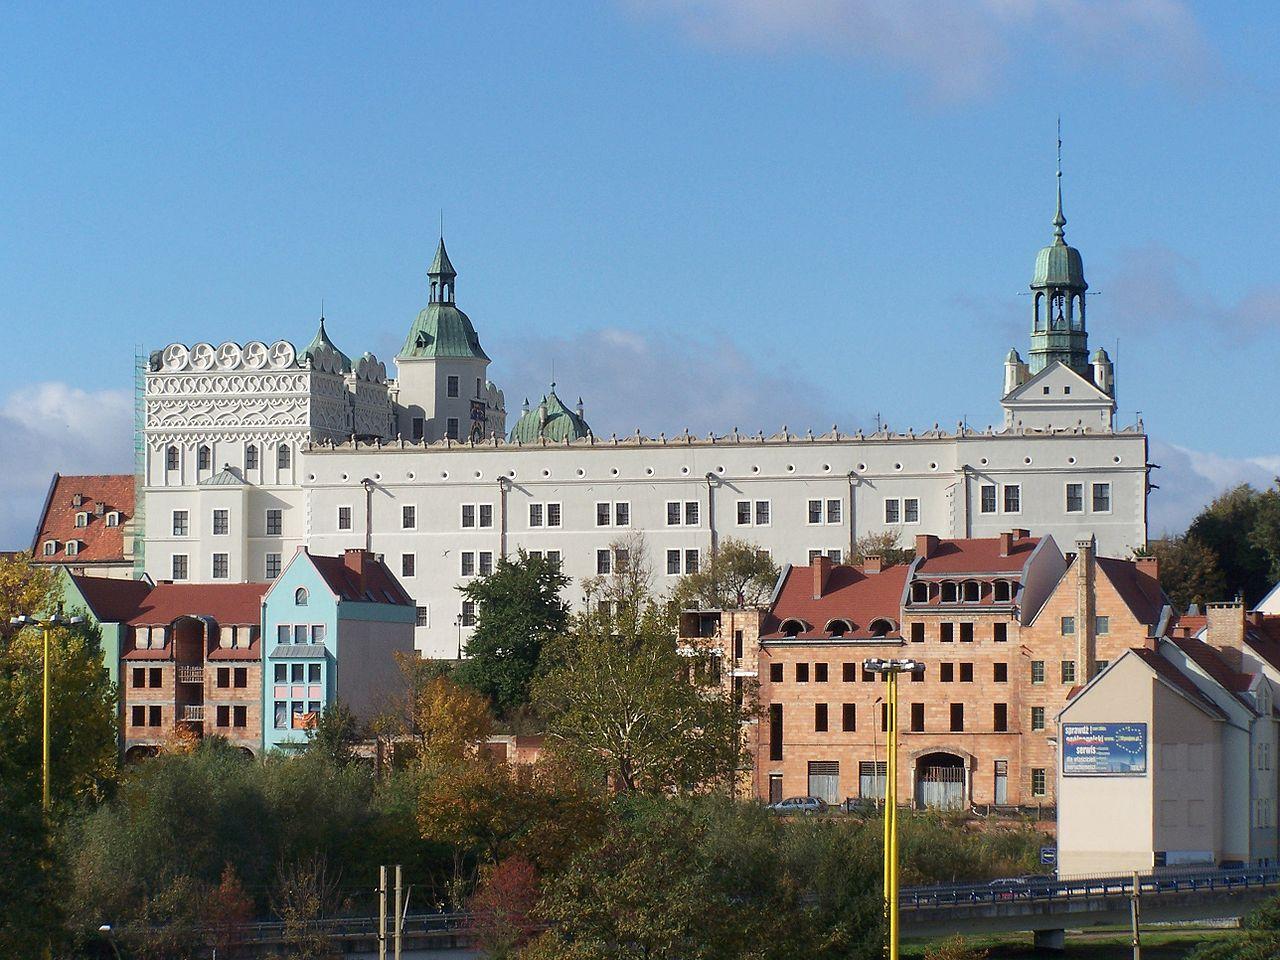 Bild Stettiner Schloss  (Zamek Ksiazat Pomorskich)